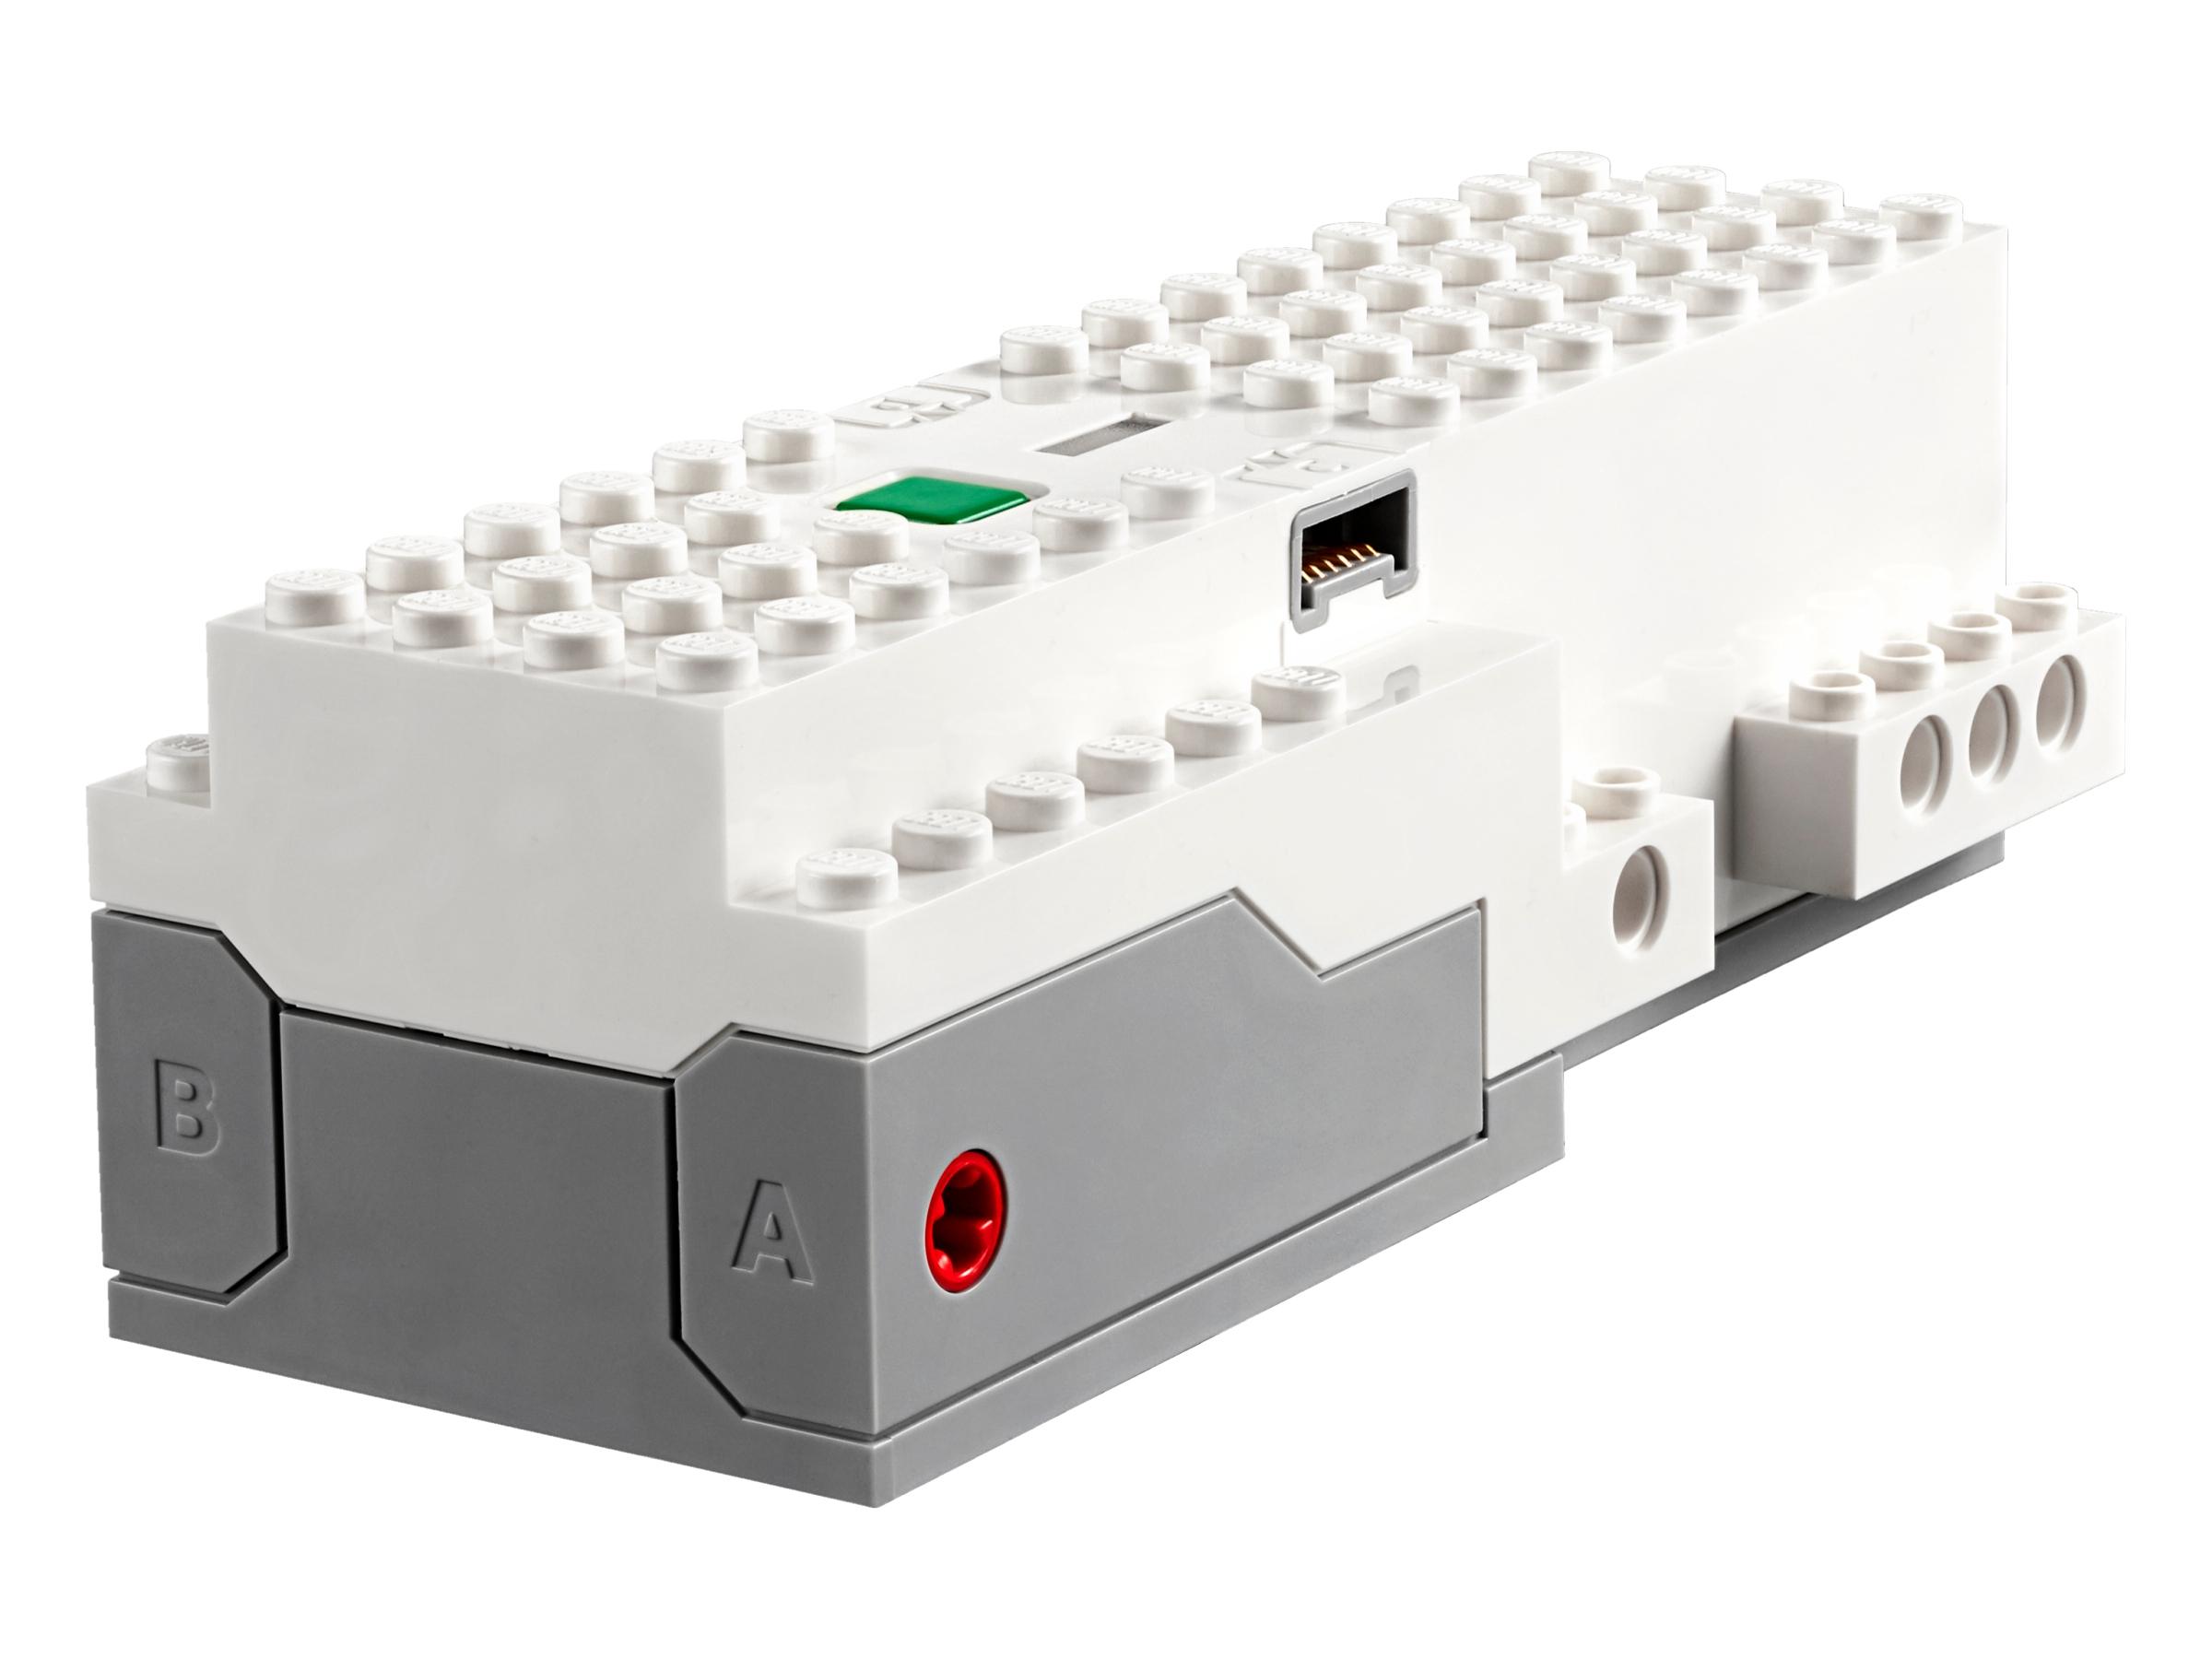 lego 88006 move hub kallistusosa